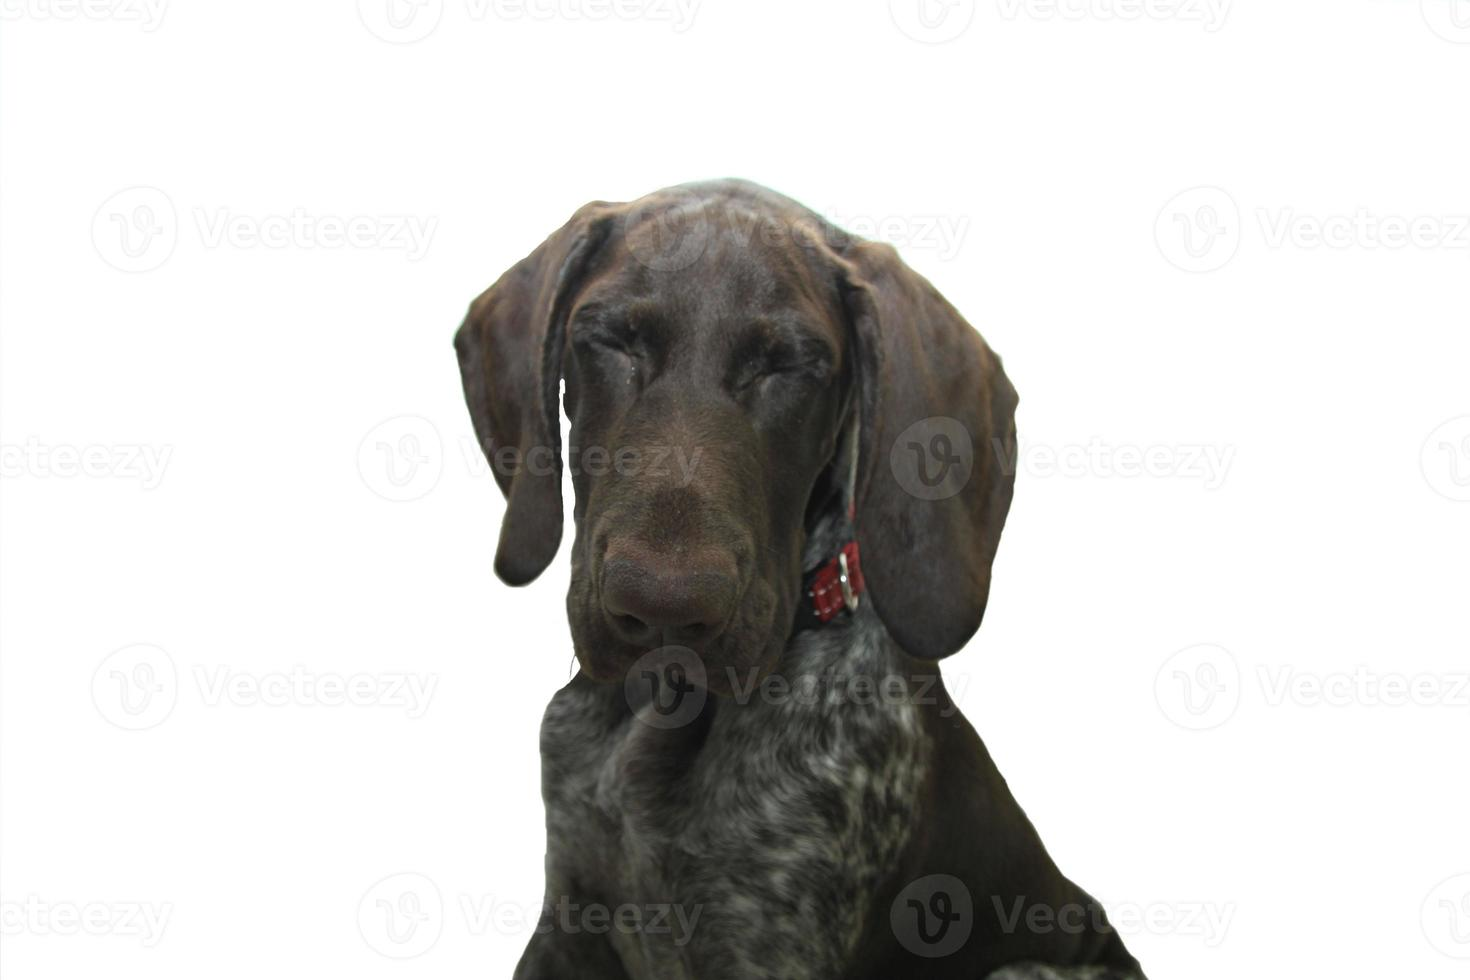 cachorro de puntero de pelo corto alemán foto